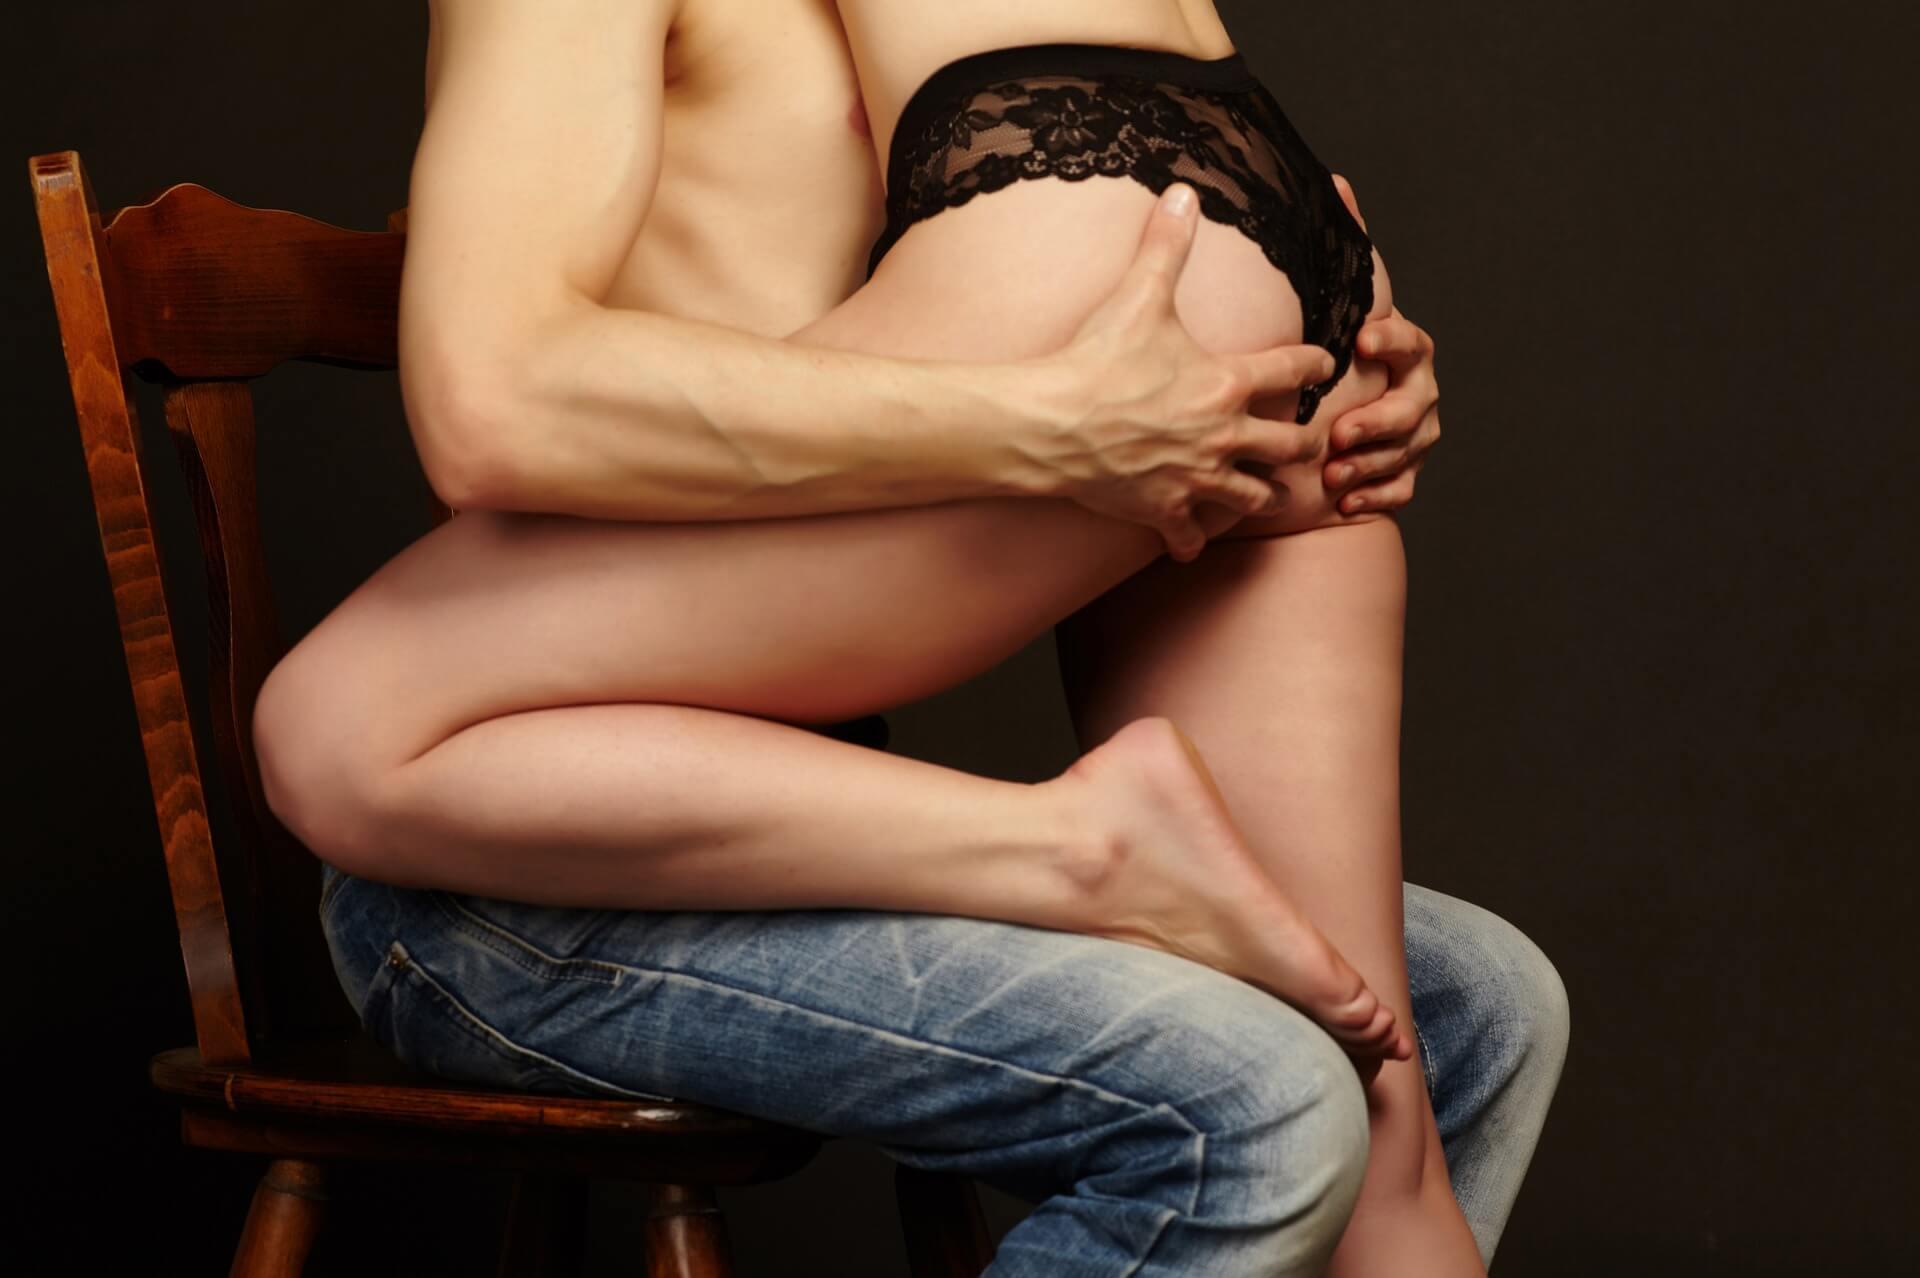 Juguetes Sexuales para Pareja